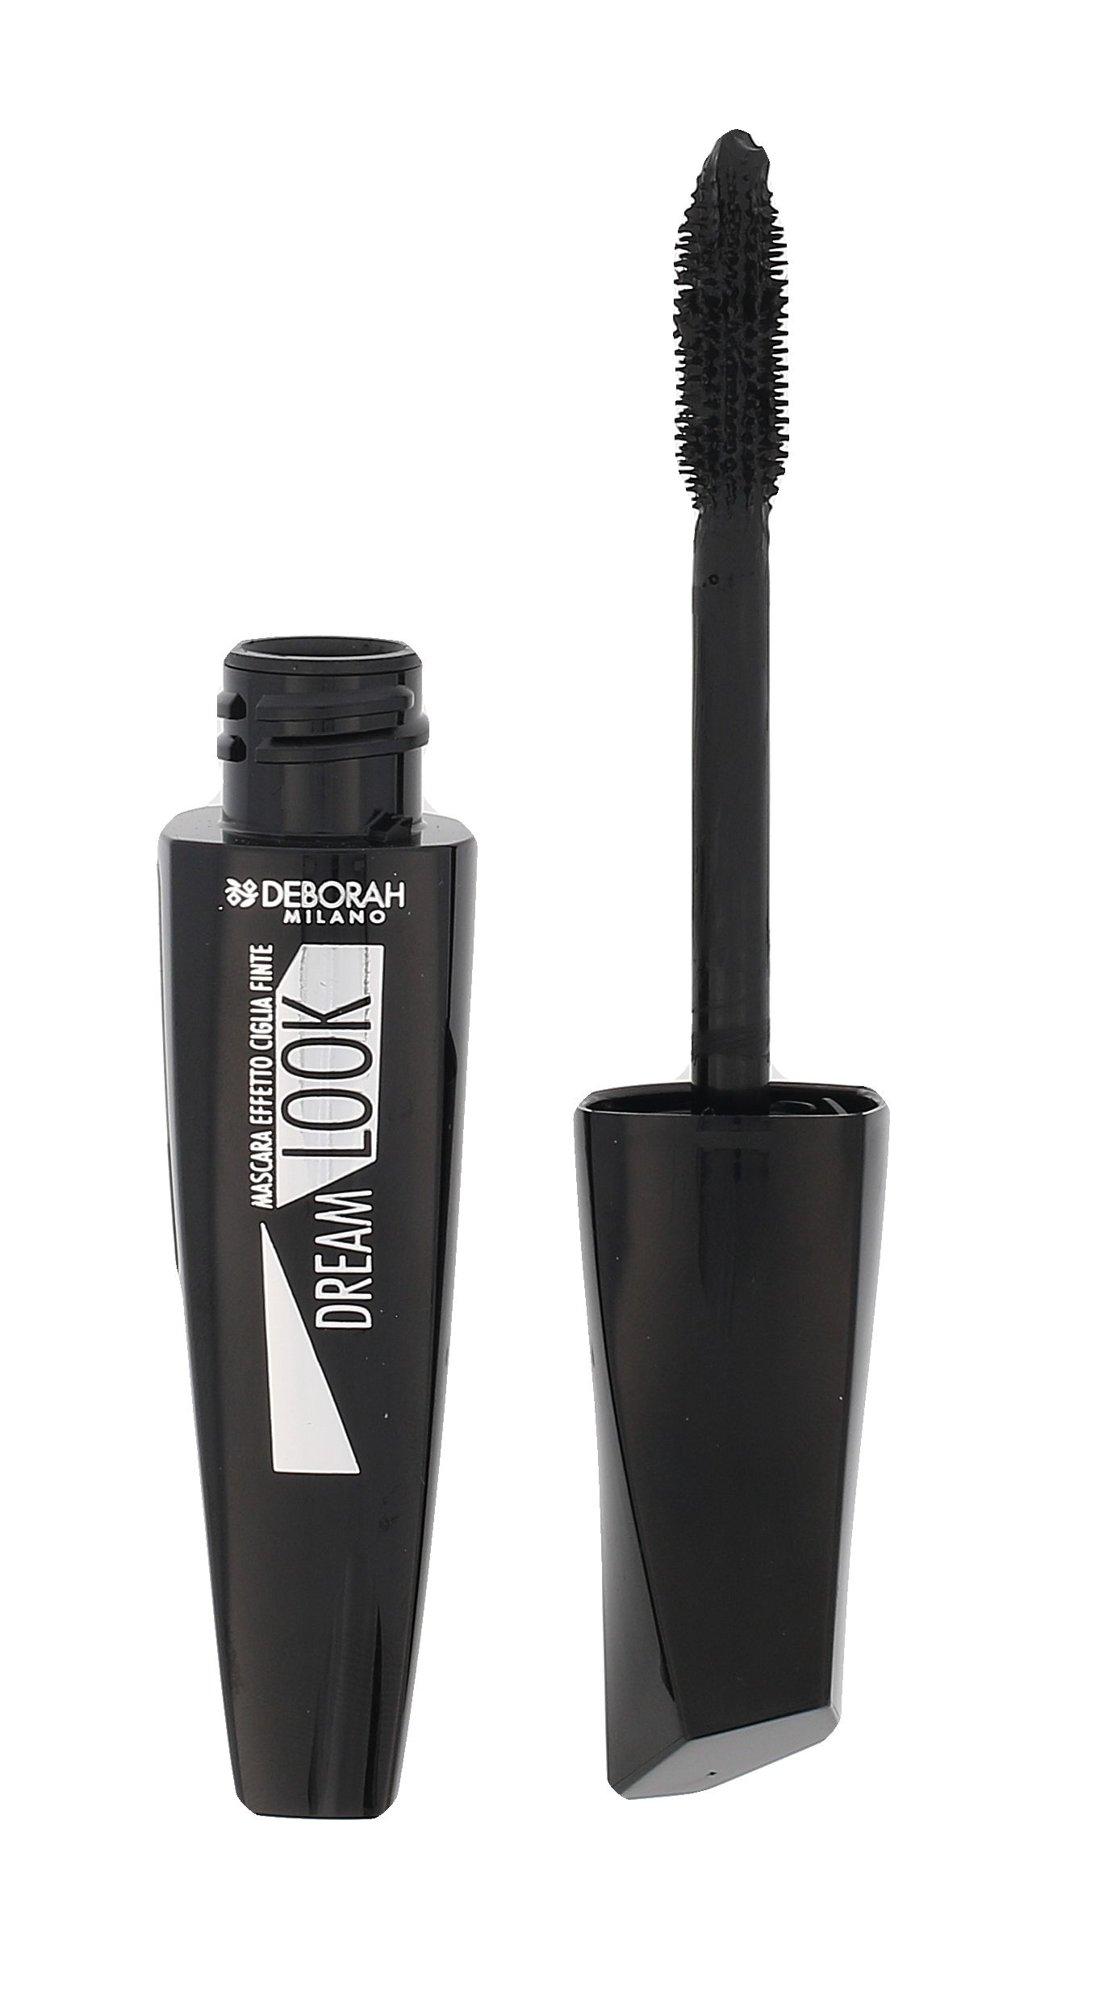 Deborah Milano Dream Look Cosmetic 12ml Black